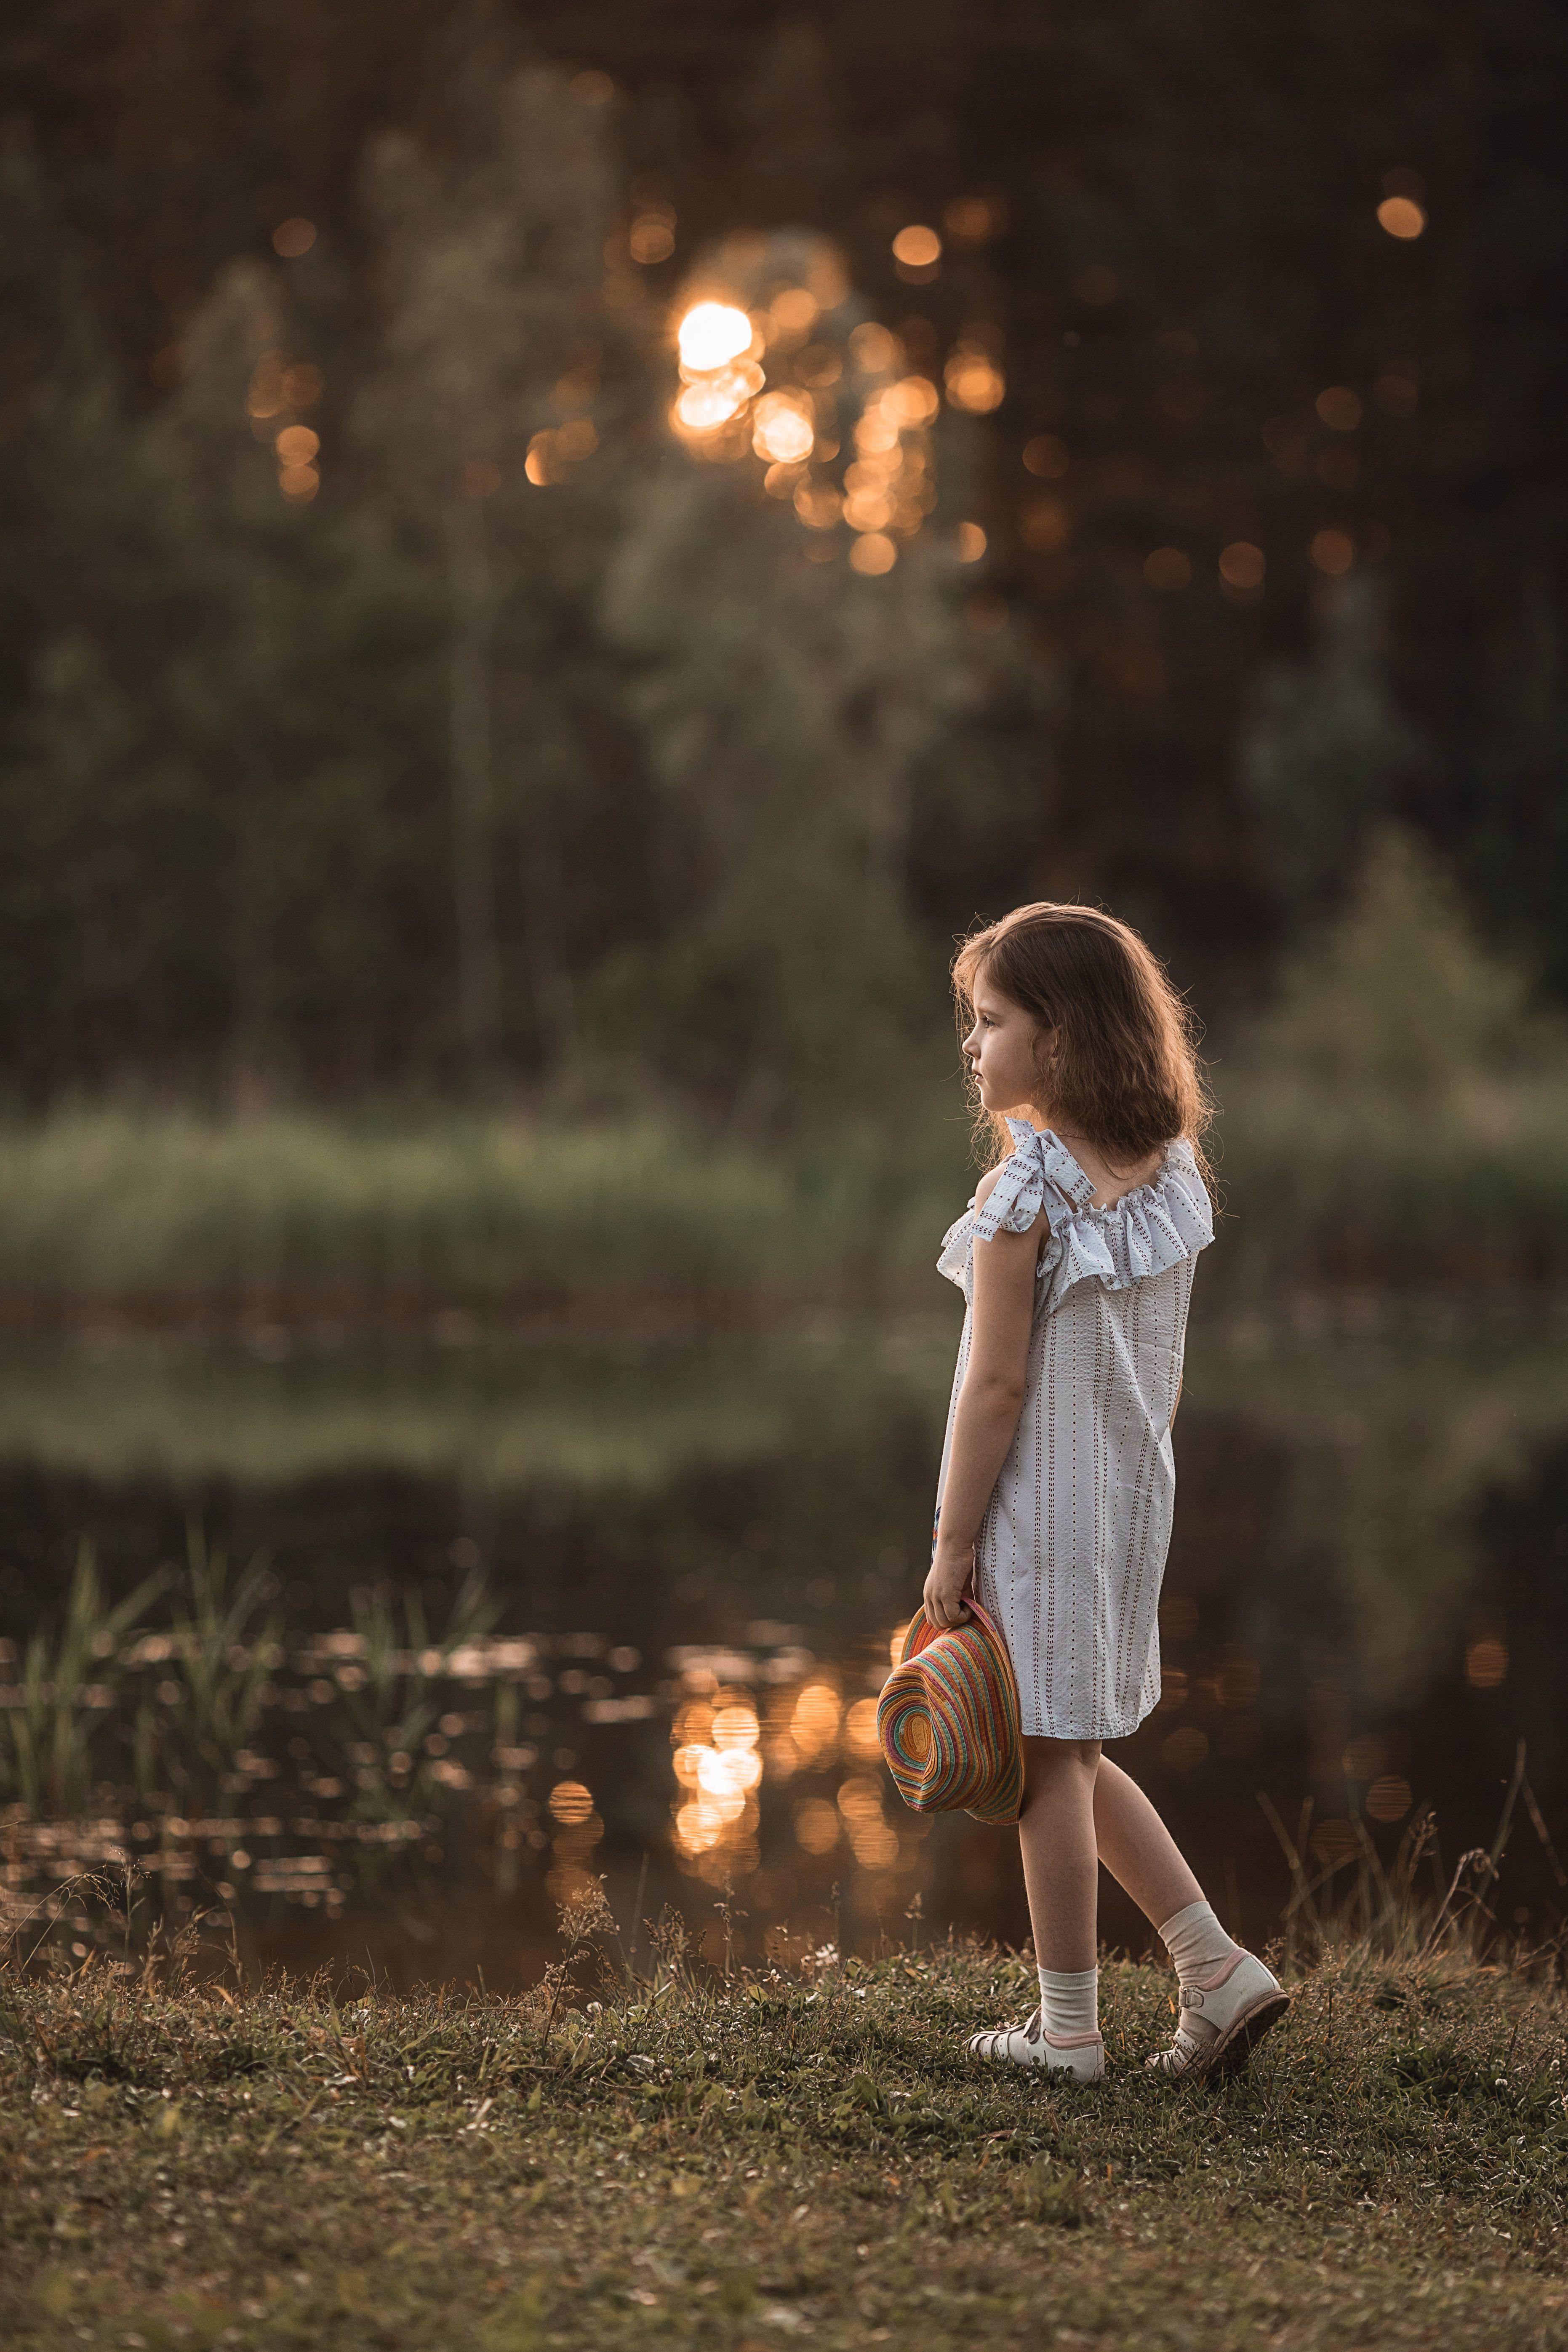 девочка, фотосессия, лето, прогулка, репортаж, little girl, summer, portrait, портрет, закат, sunset, пруд, pond, вода, water, счастье, happy, Васильев Владимир